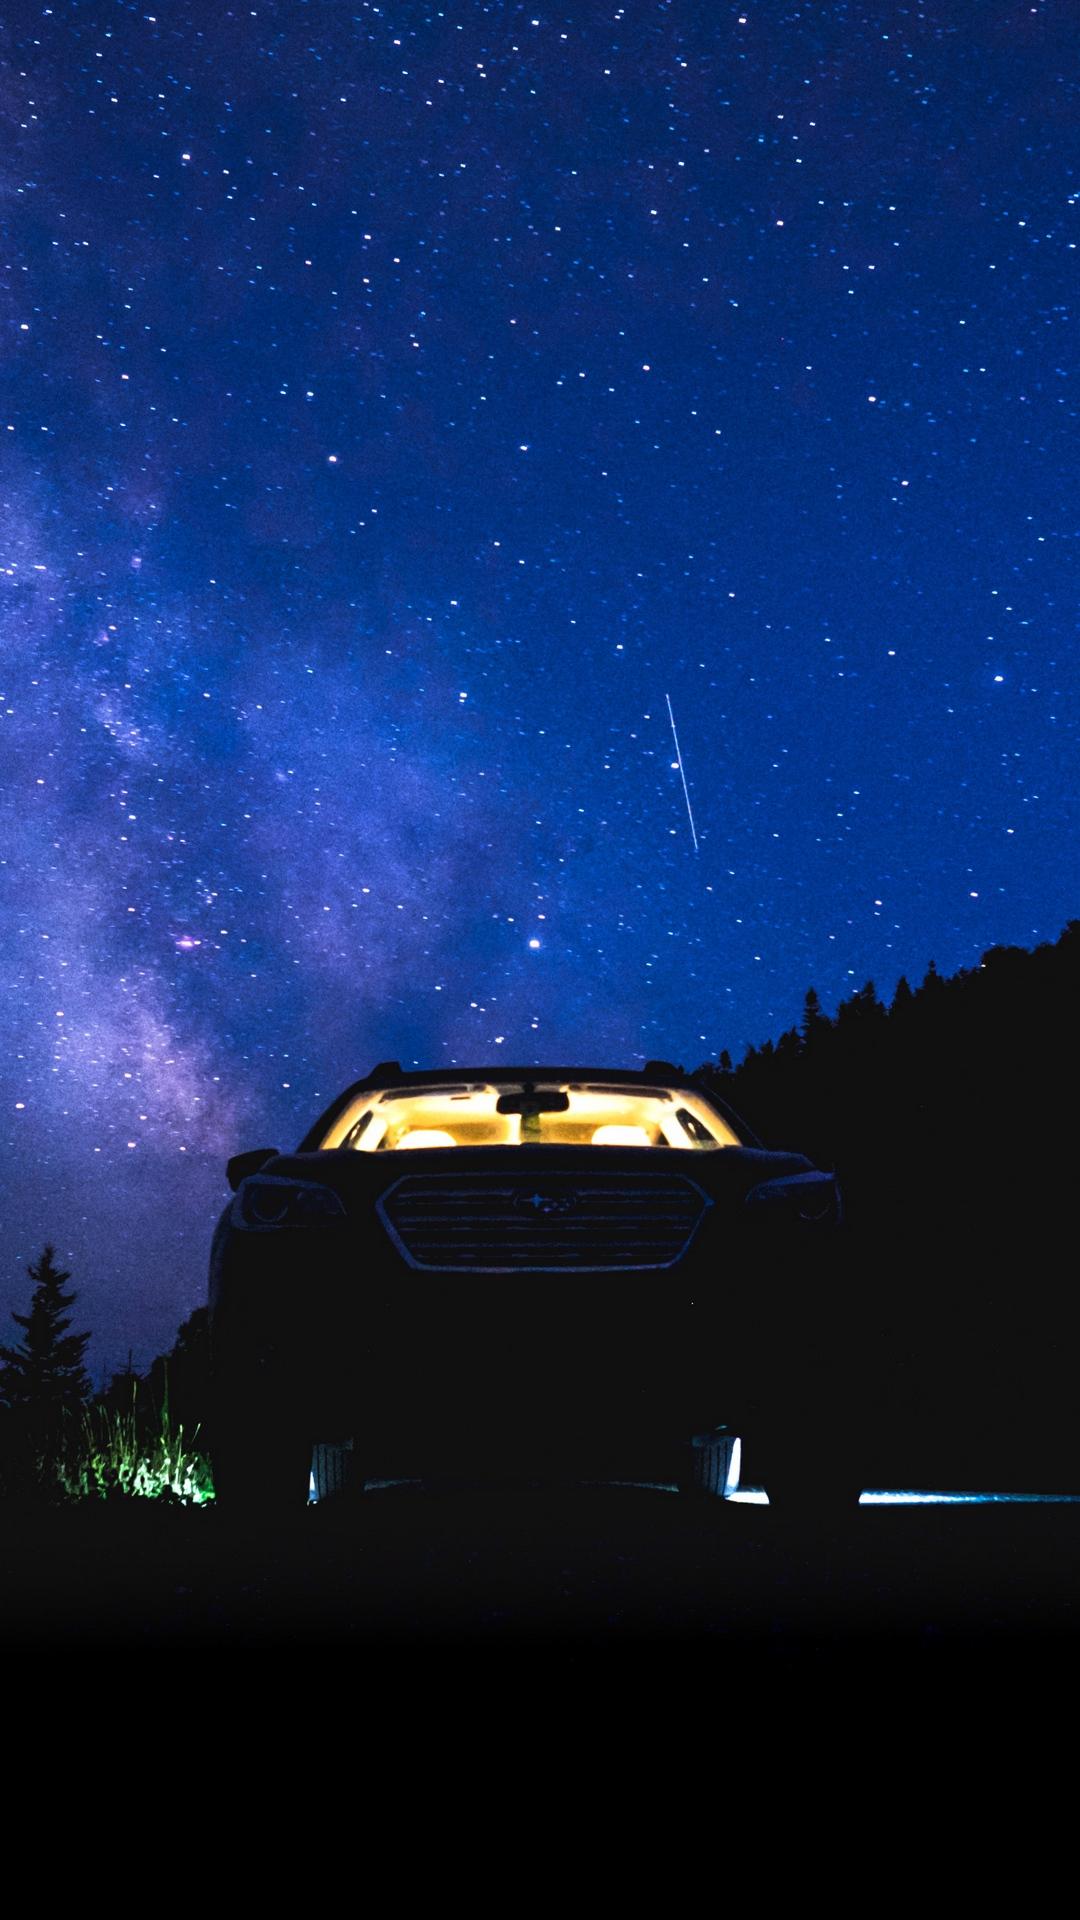 Starry Sky Night Car Wallpaper - 1080x1920